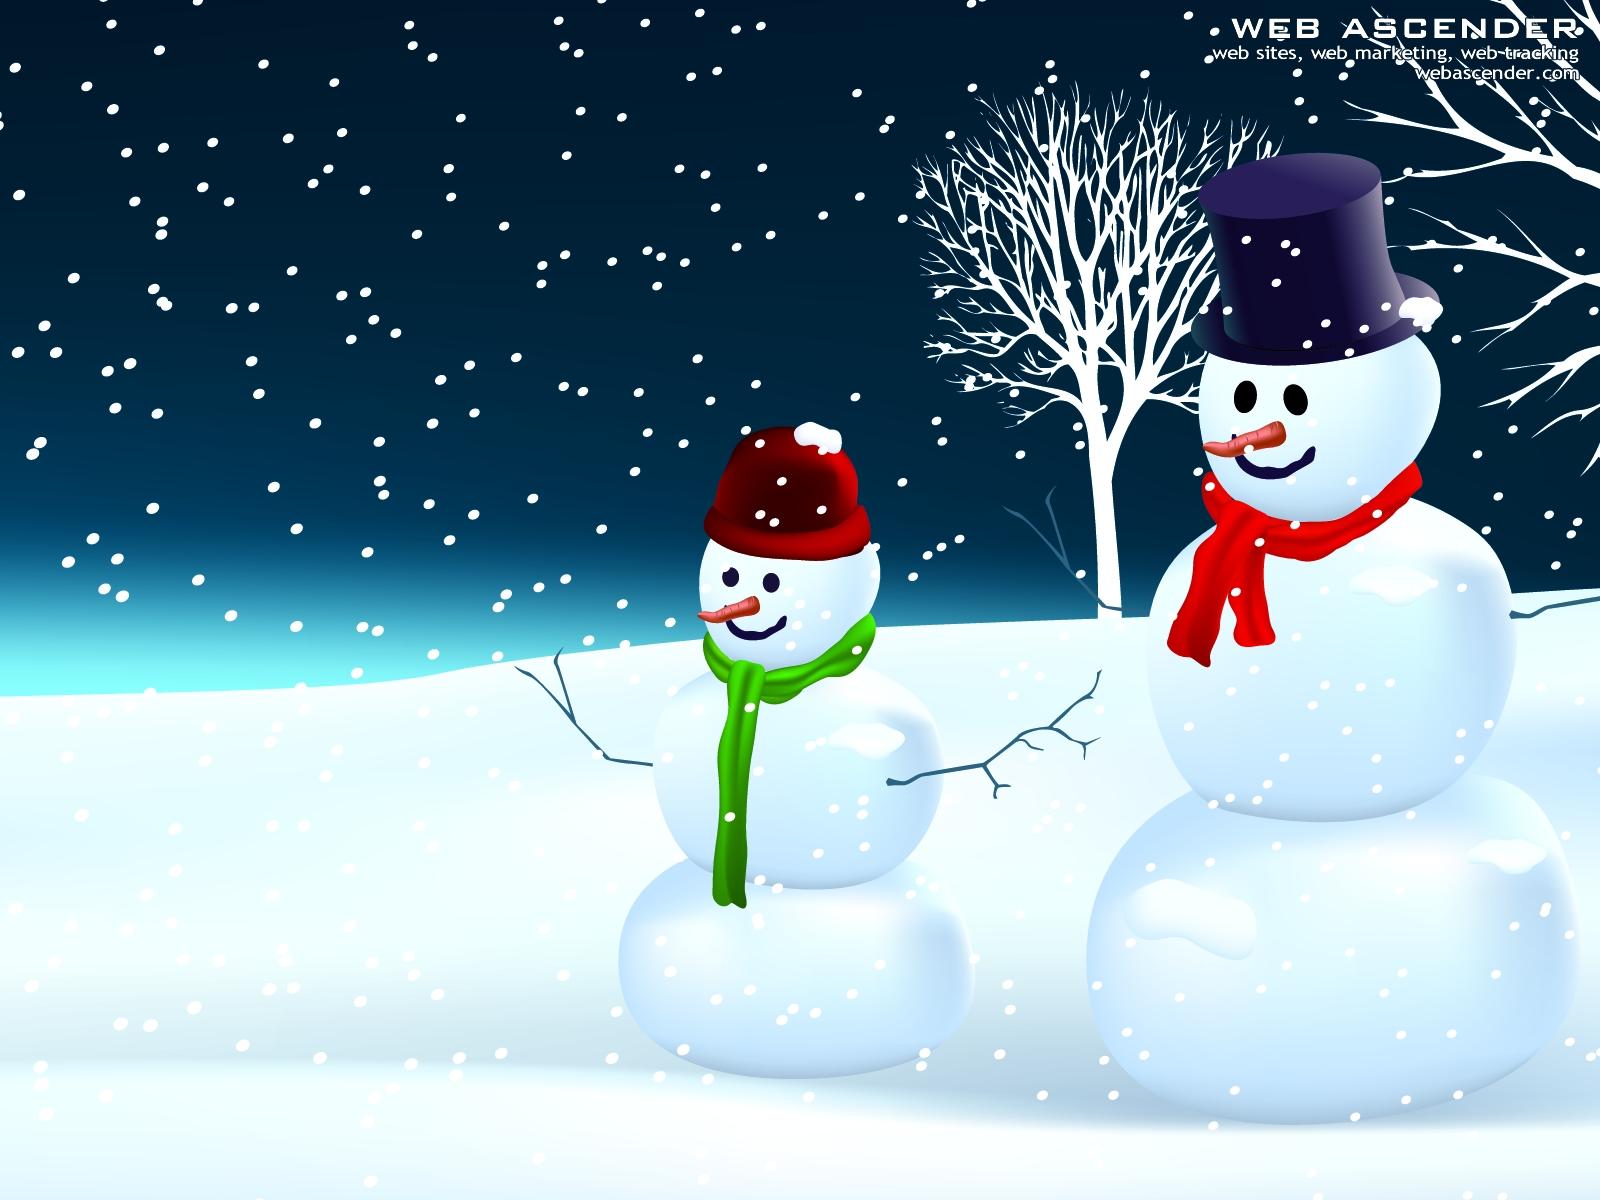 snowman-wallpaper-1600x1200